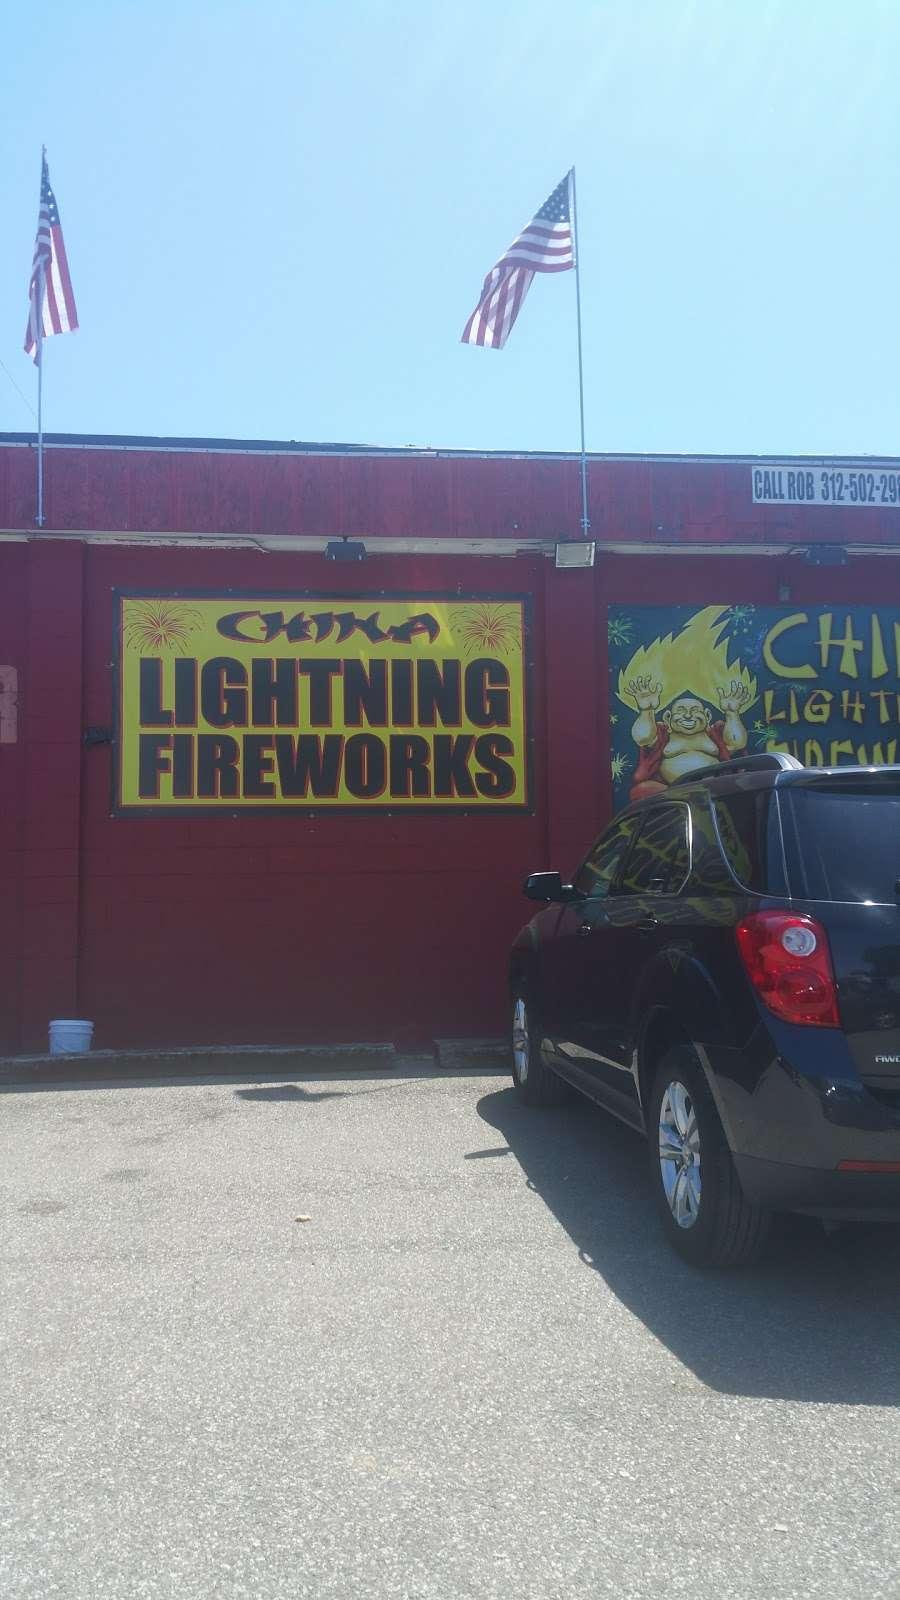 Lightning Fireworks - store    Photo 6 of 9   Address: 9401 Melton Rd, Gary, IN 46403, USA   Phone: (312) 502-2987